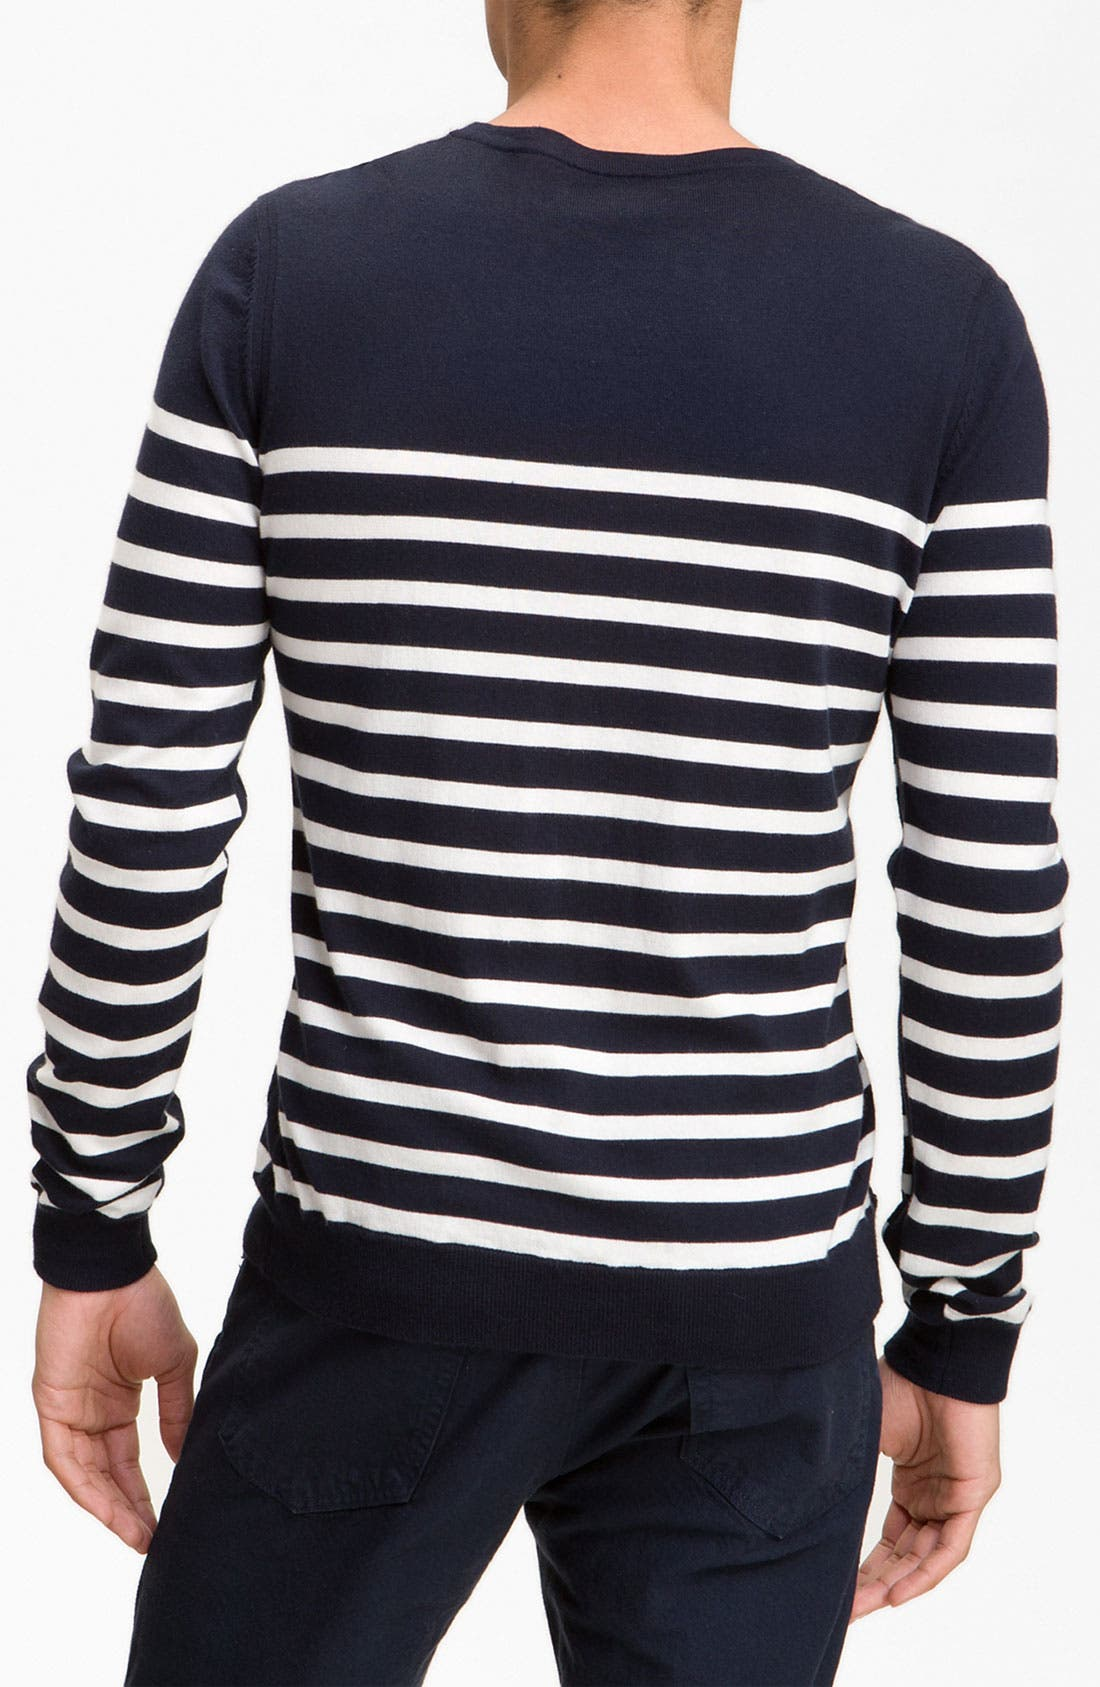 Alternate Image 2  - rag & bone 'Basque' Crewneck Sweater